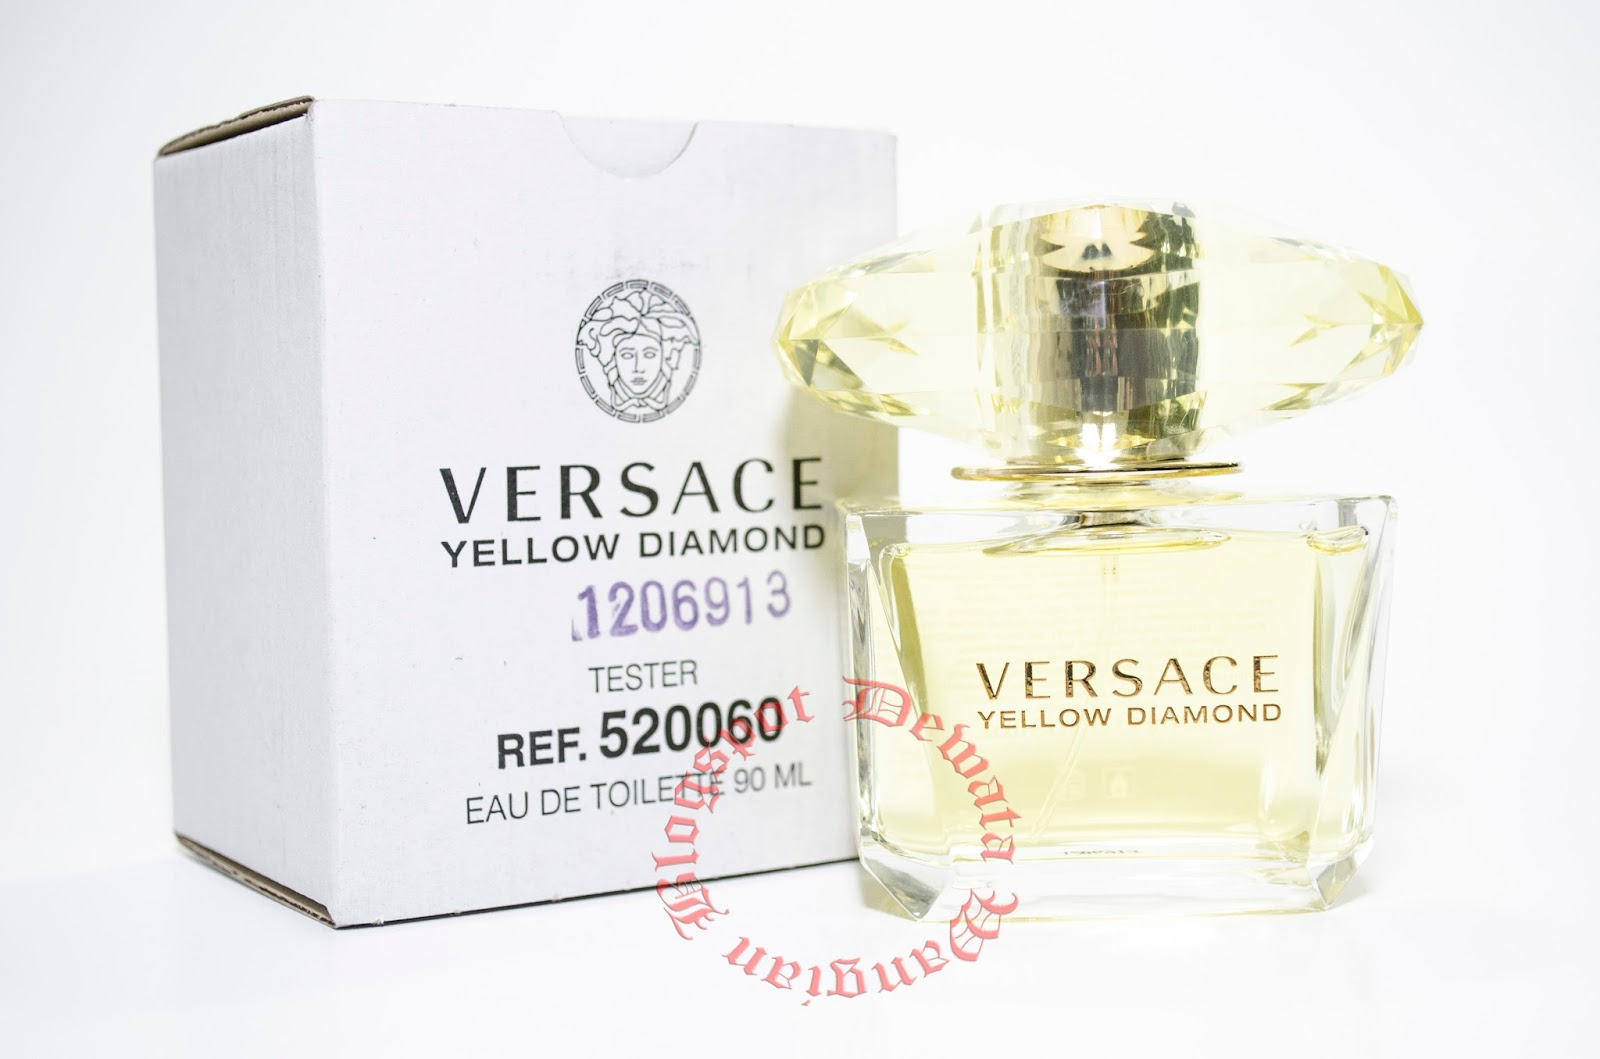 Wangianperfume Cosmetic Original Terbaik Versace Yellow Diamond